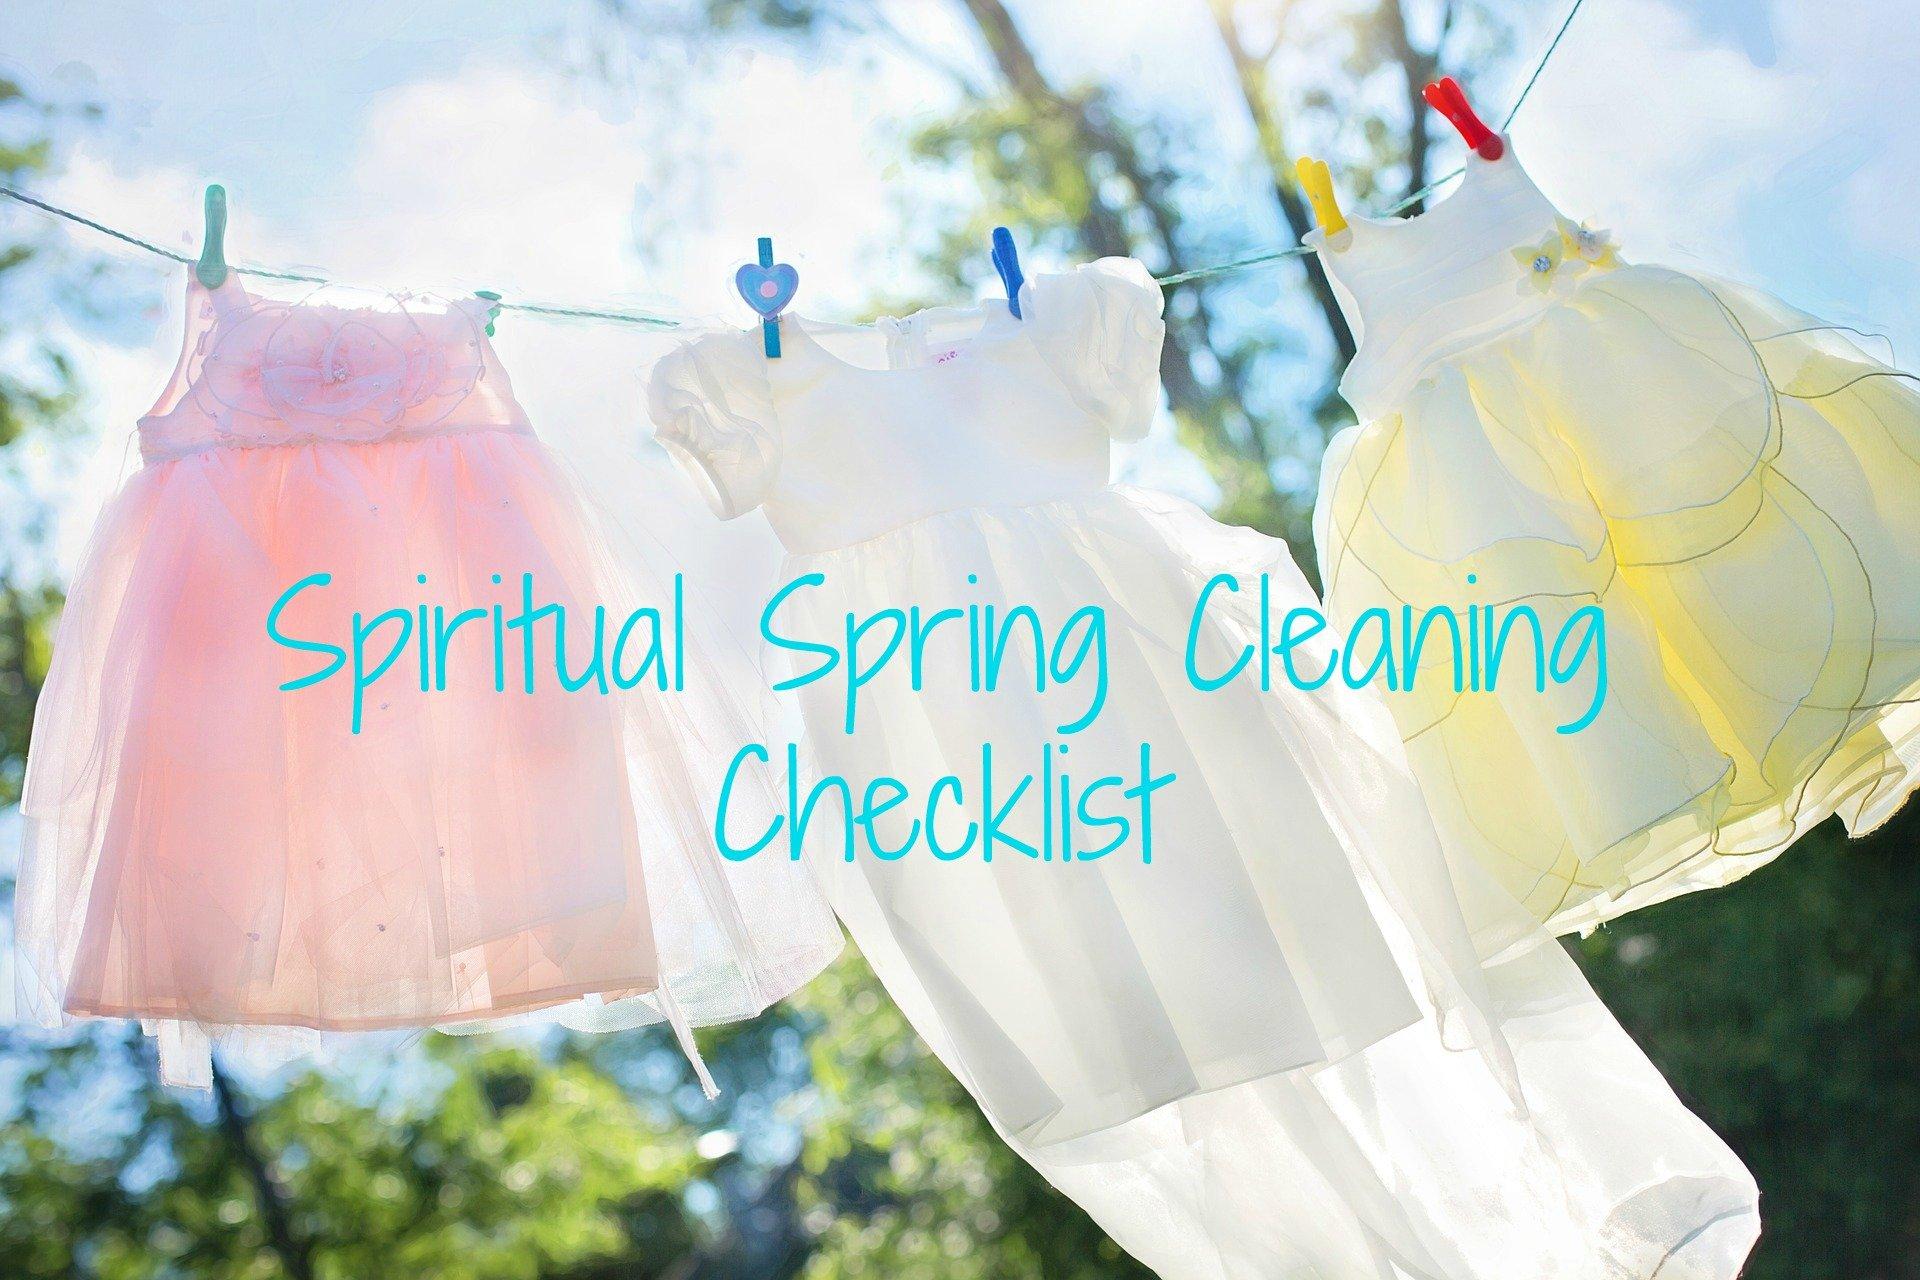 Spiritual Spring Cleaning Checklist https://beckielindsey16.com/2017/03/27/spiritual-spring-cleaning-checklist/